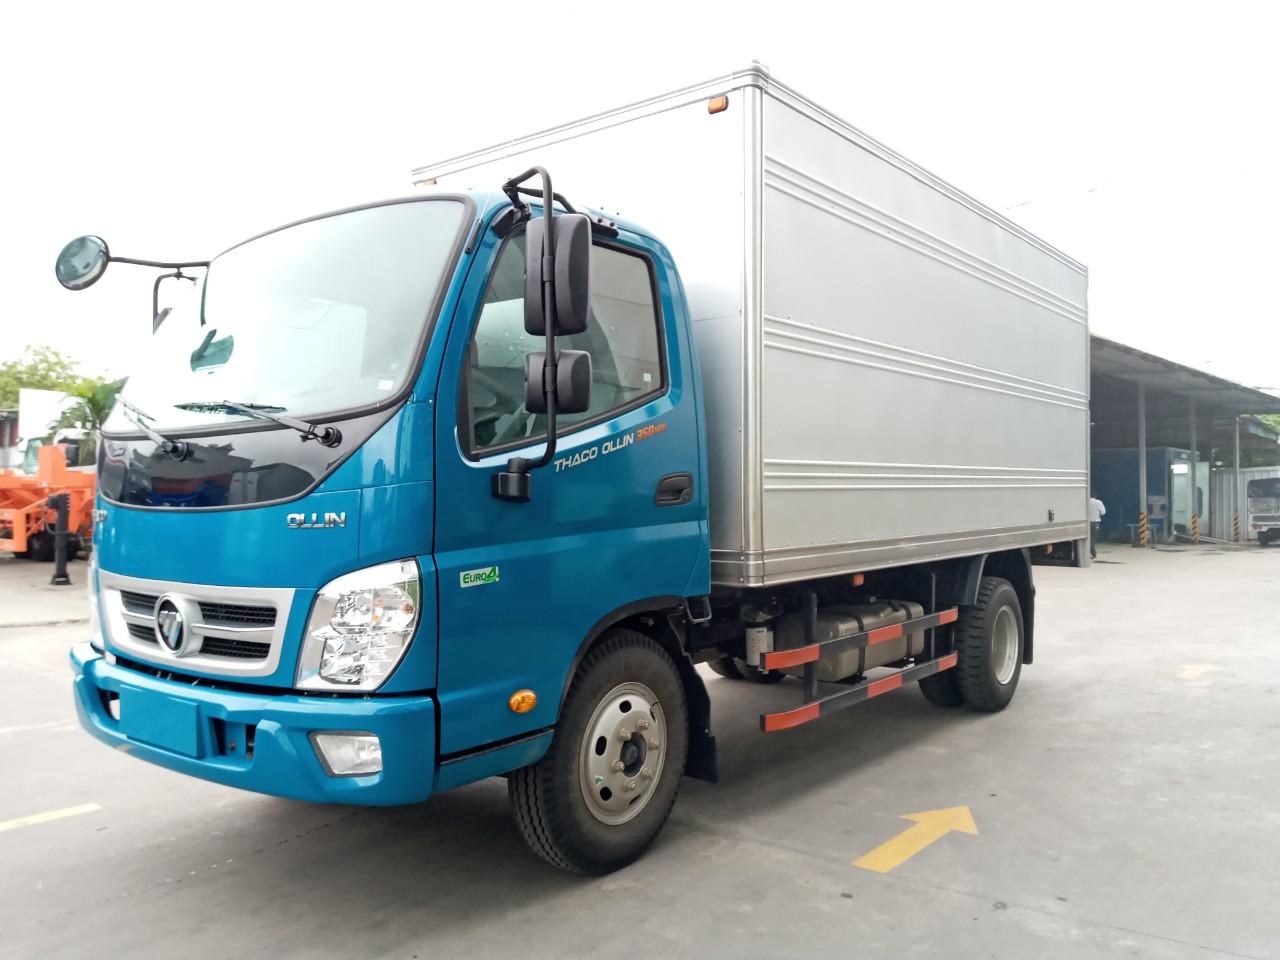 xe tải 3.5 tấn tại hải phòng Thaco Ollin 350